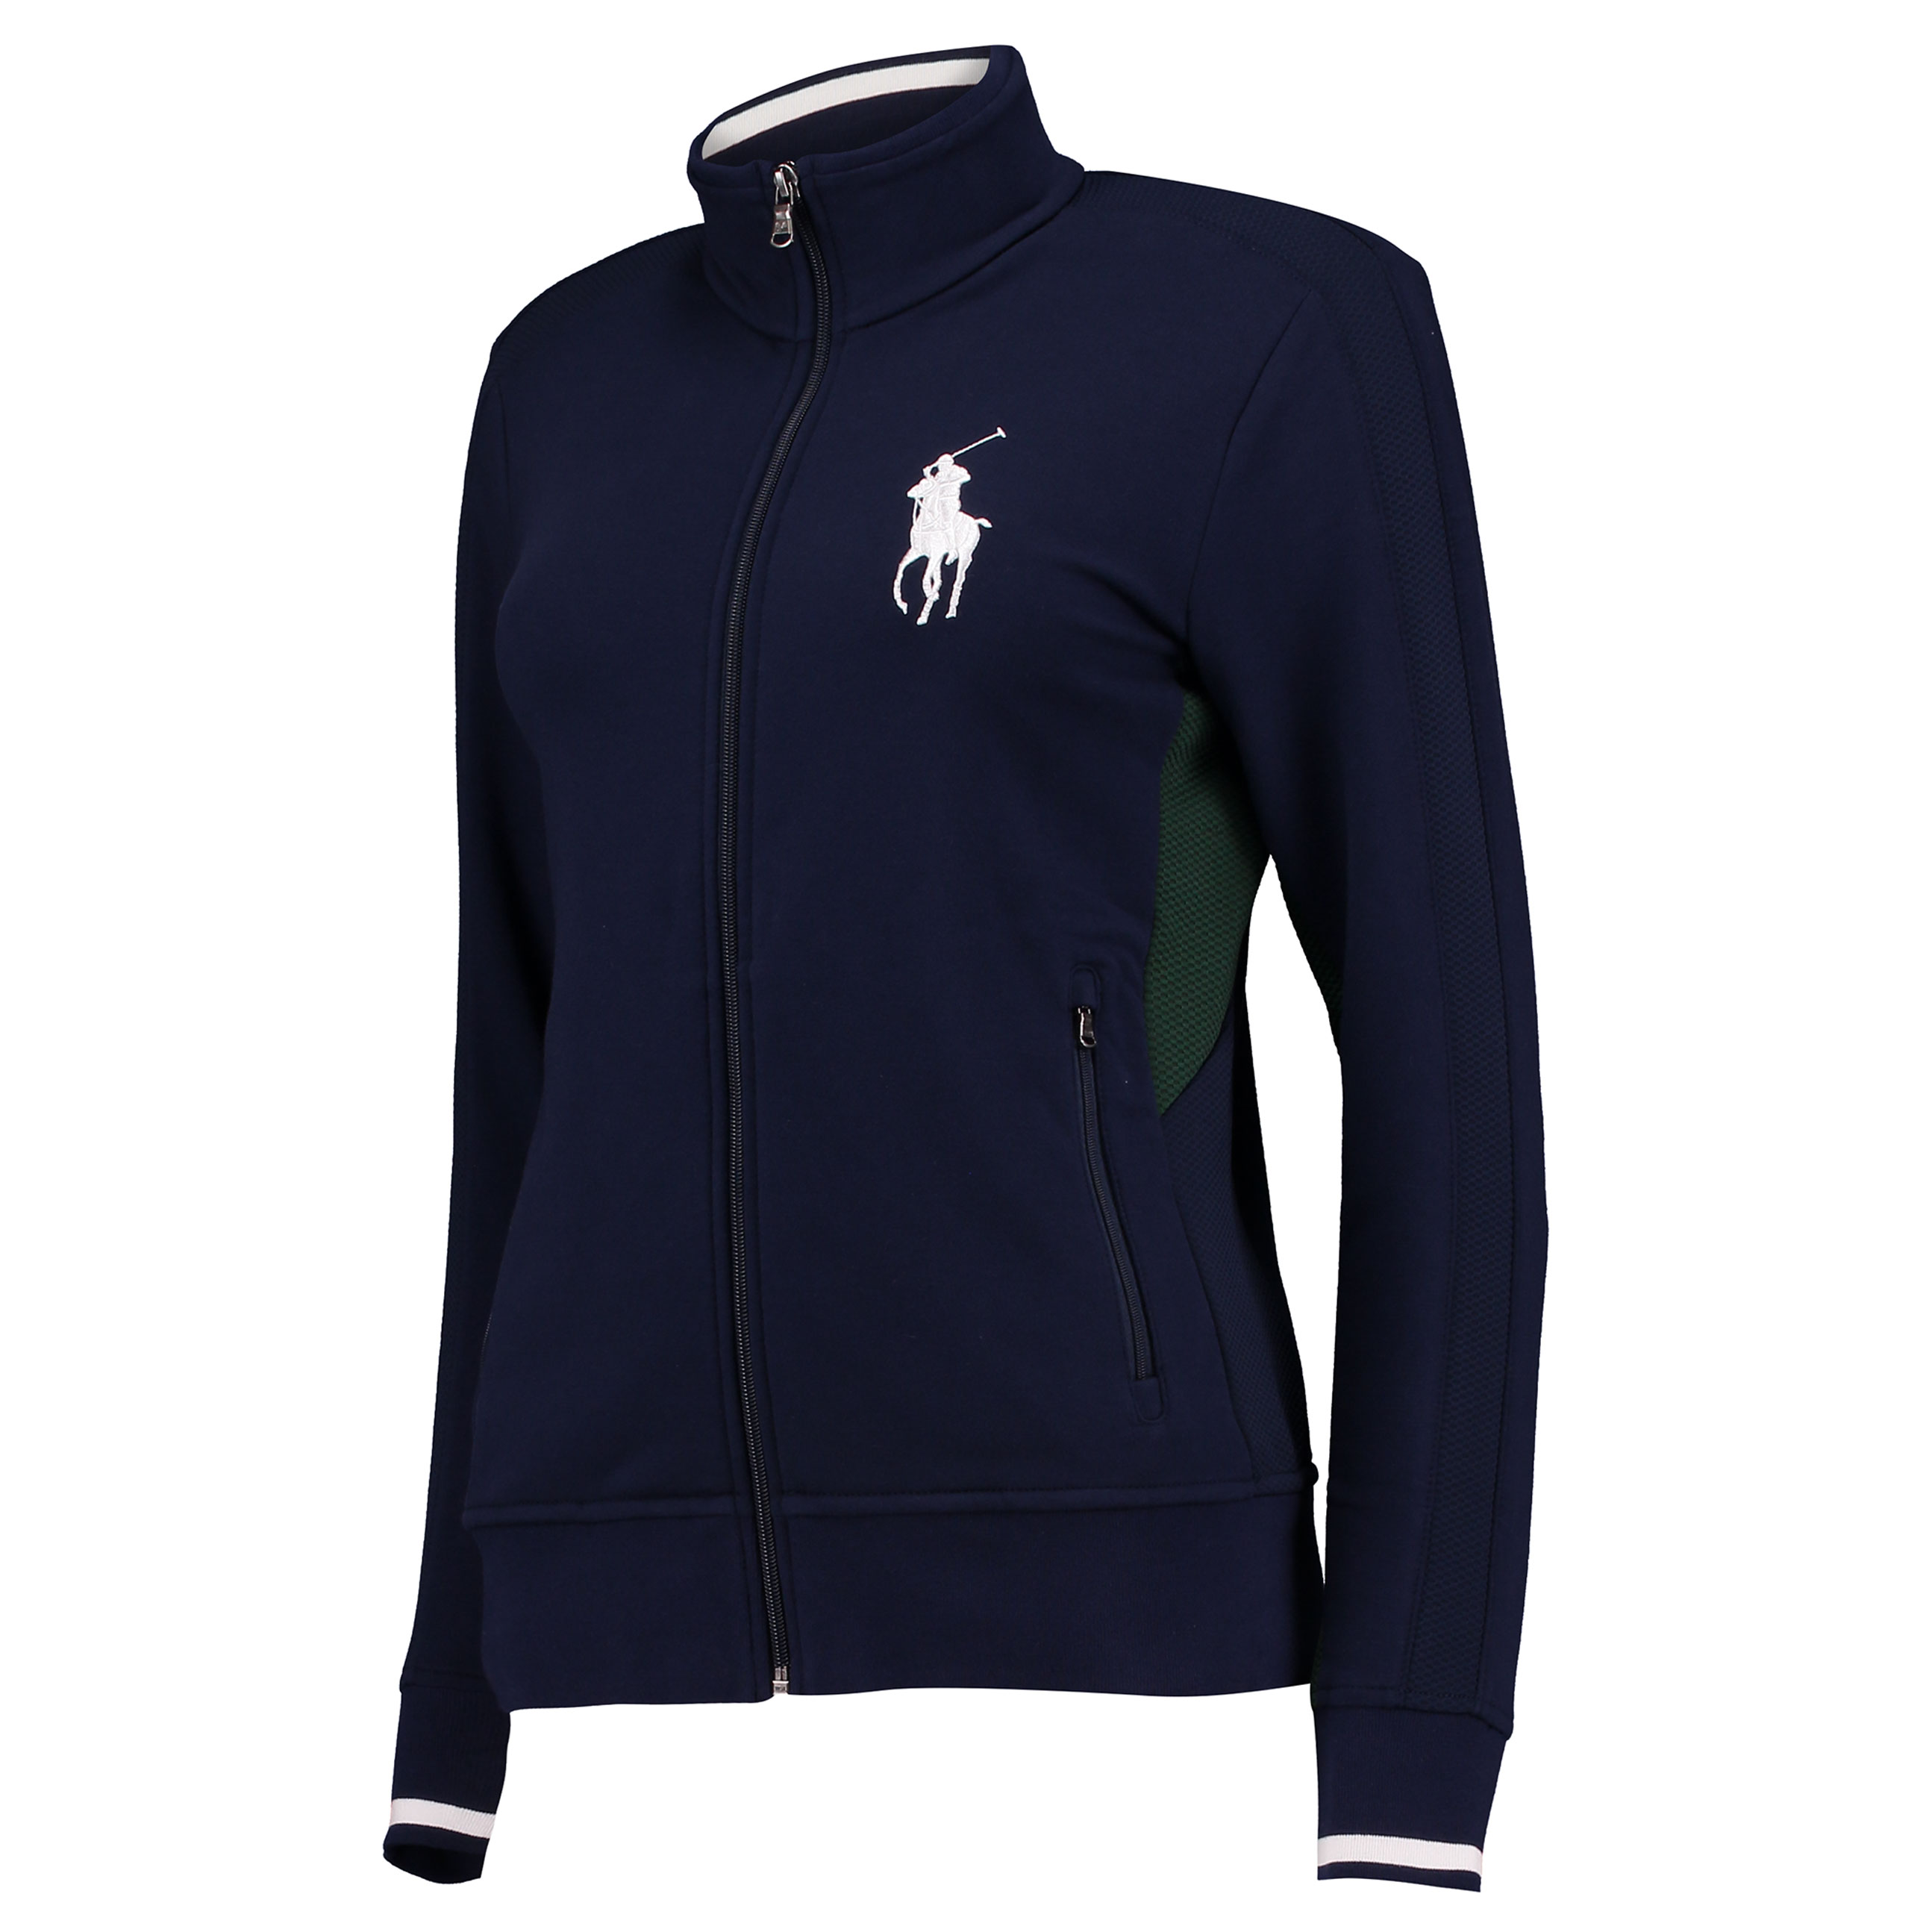 Wimbledon Ralph Lauren Ball Girl Warm Up Jacket - French Navy - Ladies